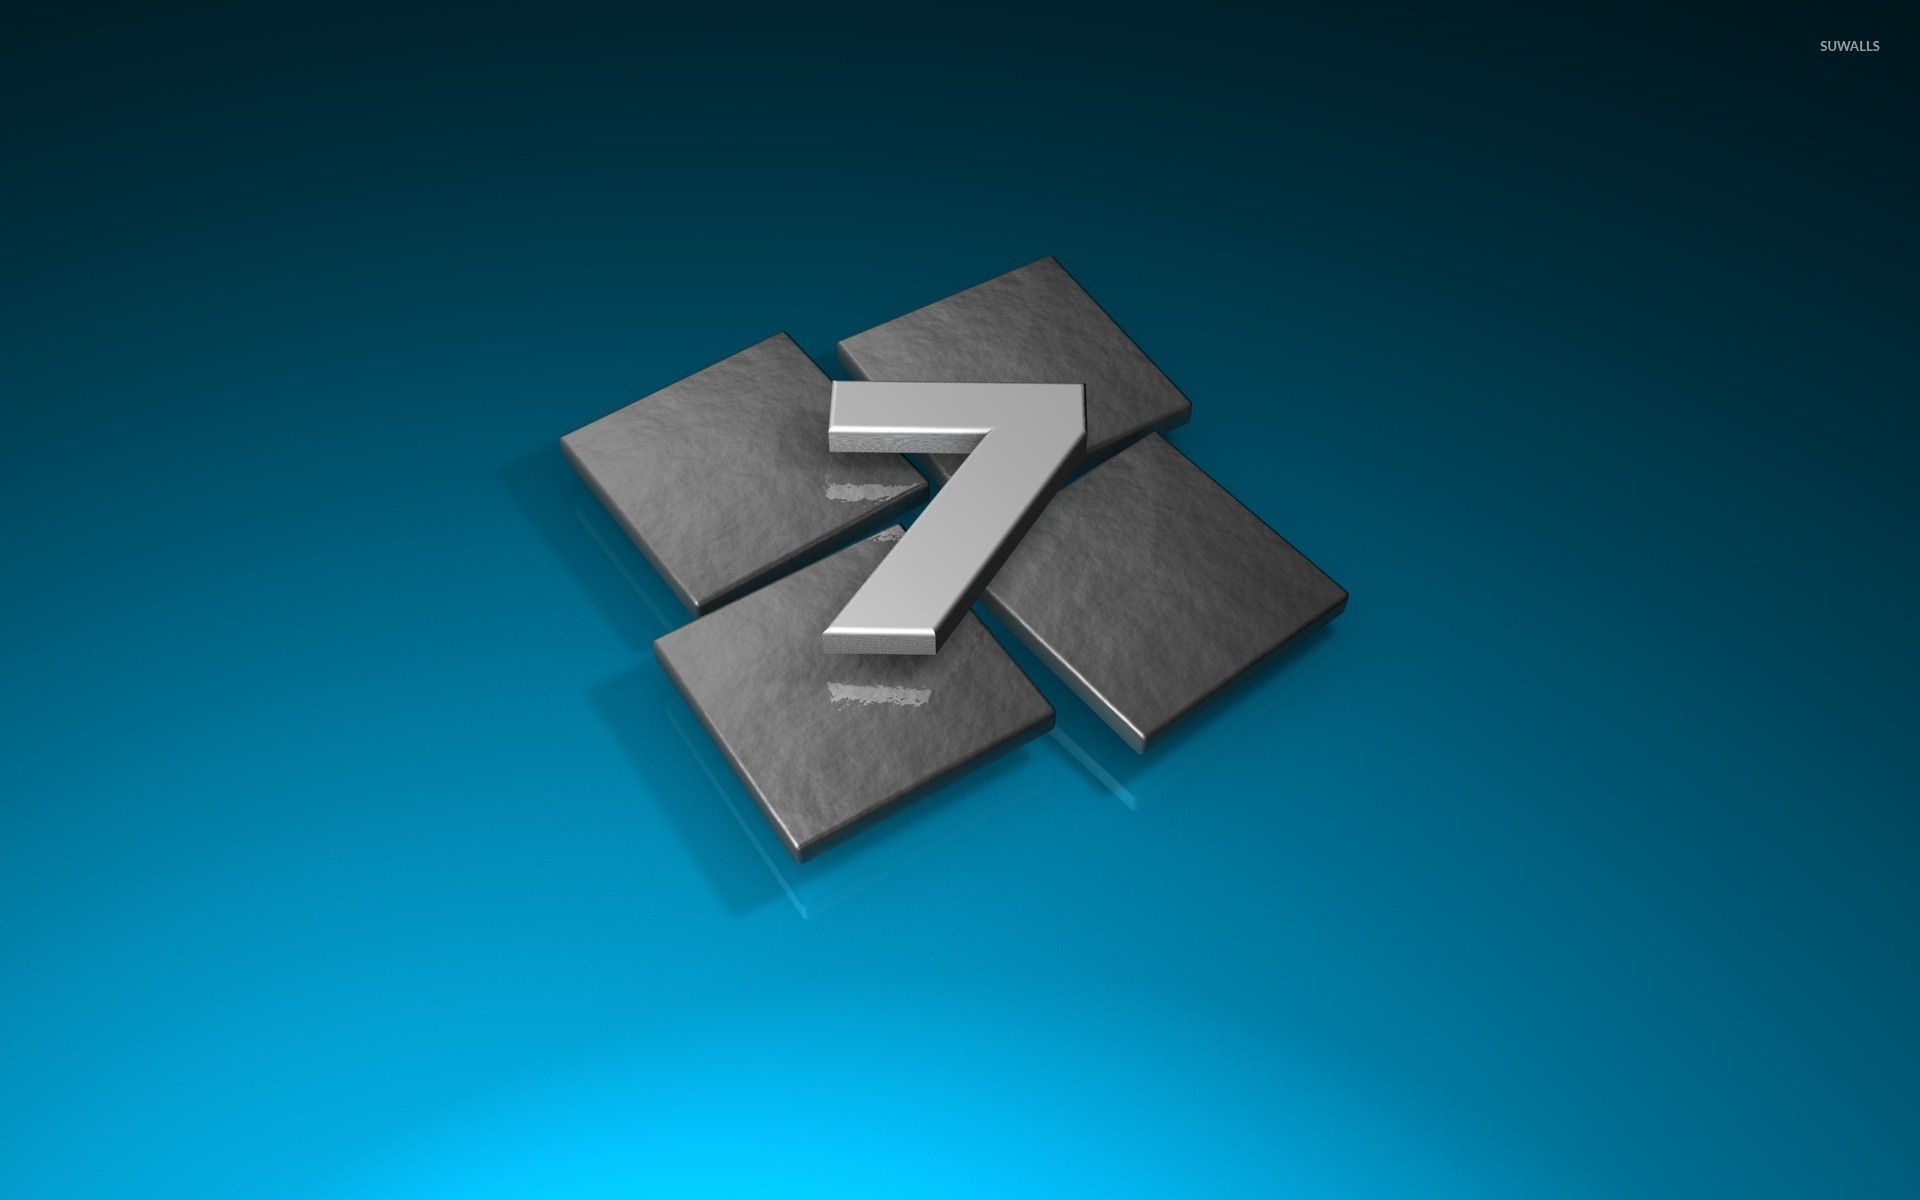 Windows 7 [31] wallpaper